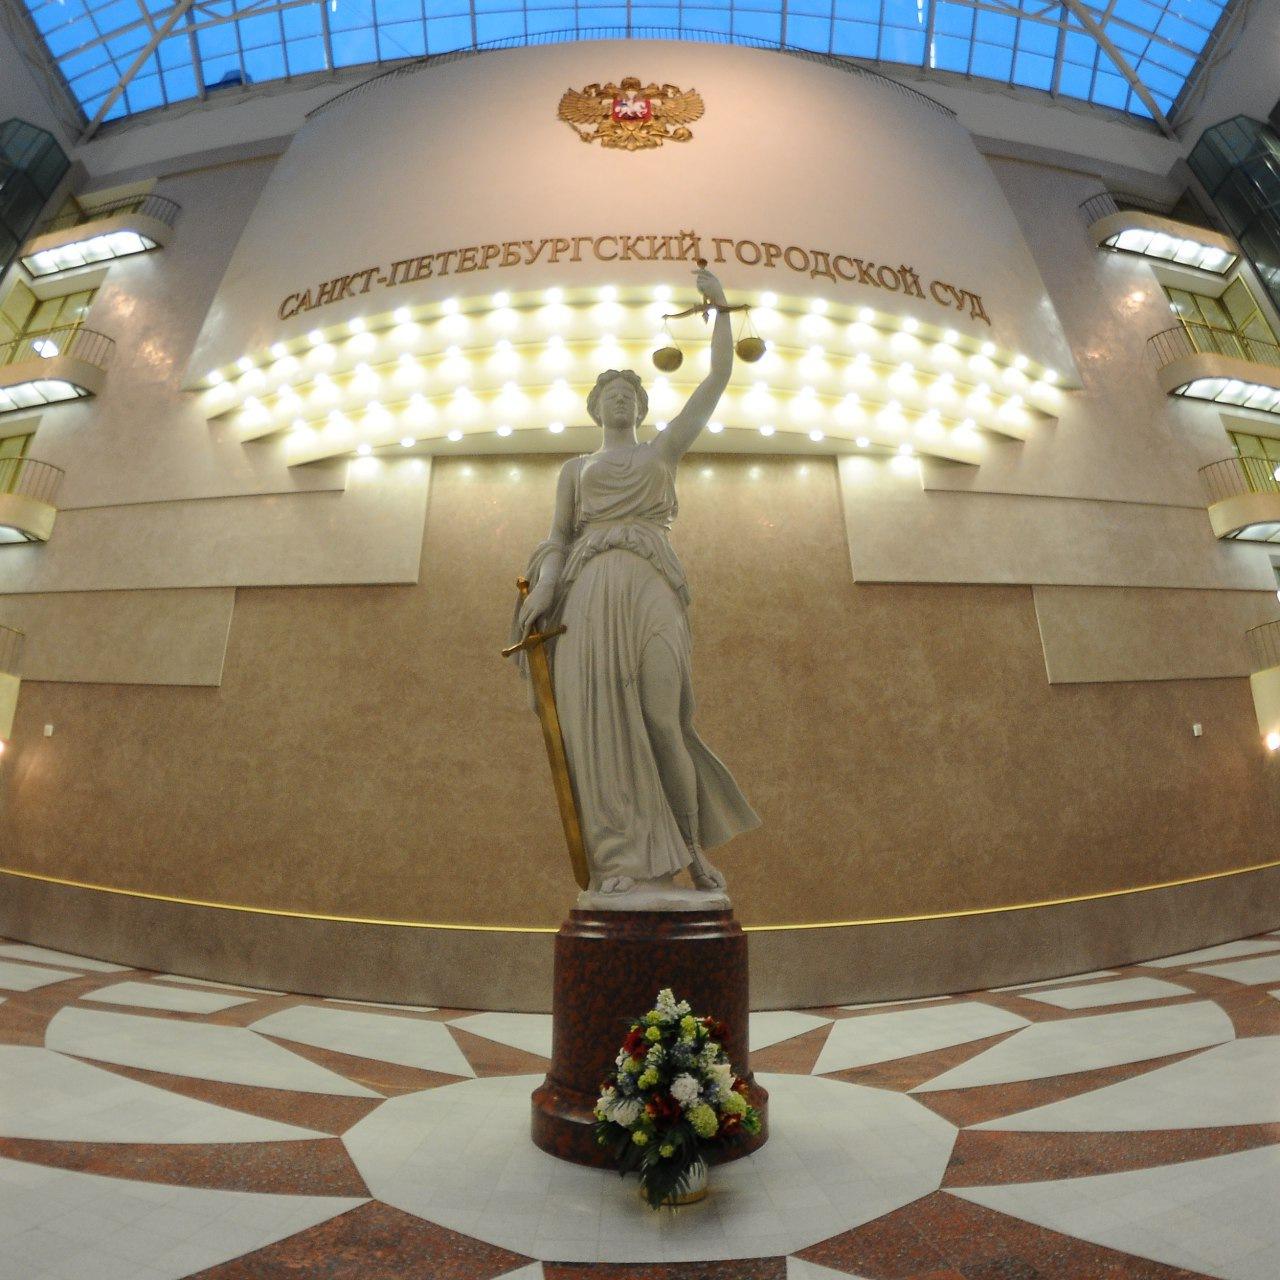 @SPbGS - Статистика канала Объединённая пресс-служба судов Санкт-Петербурга. Telegram Analytics